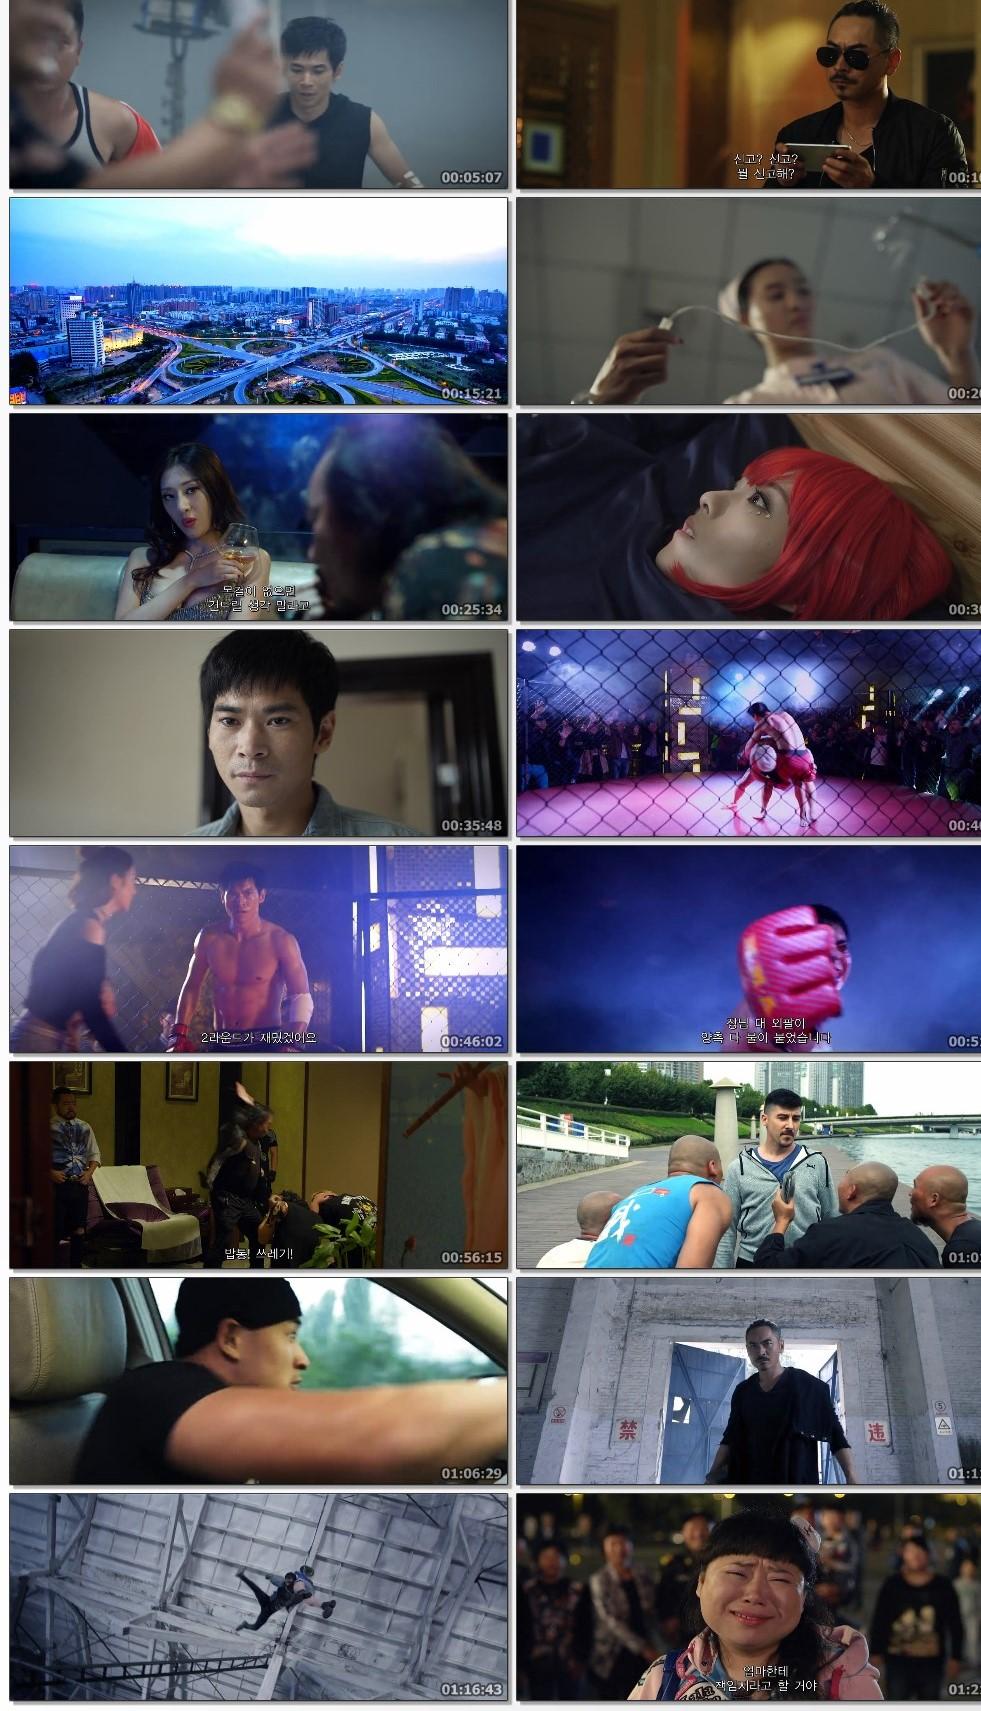 Defying-Chase-2018-www-9kmovies-work-Hindi-ORG-Dual-Audio-720p-HDRip-HC-Sub-950-MB-mkv-thumbsd13e3d6